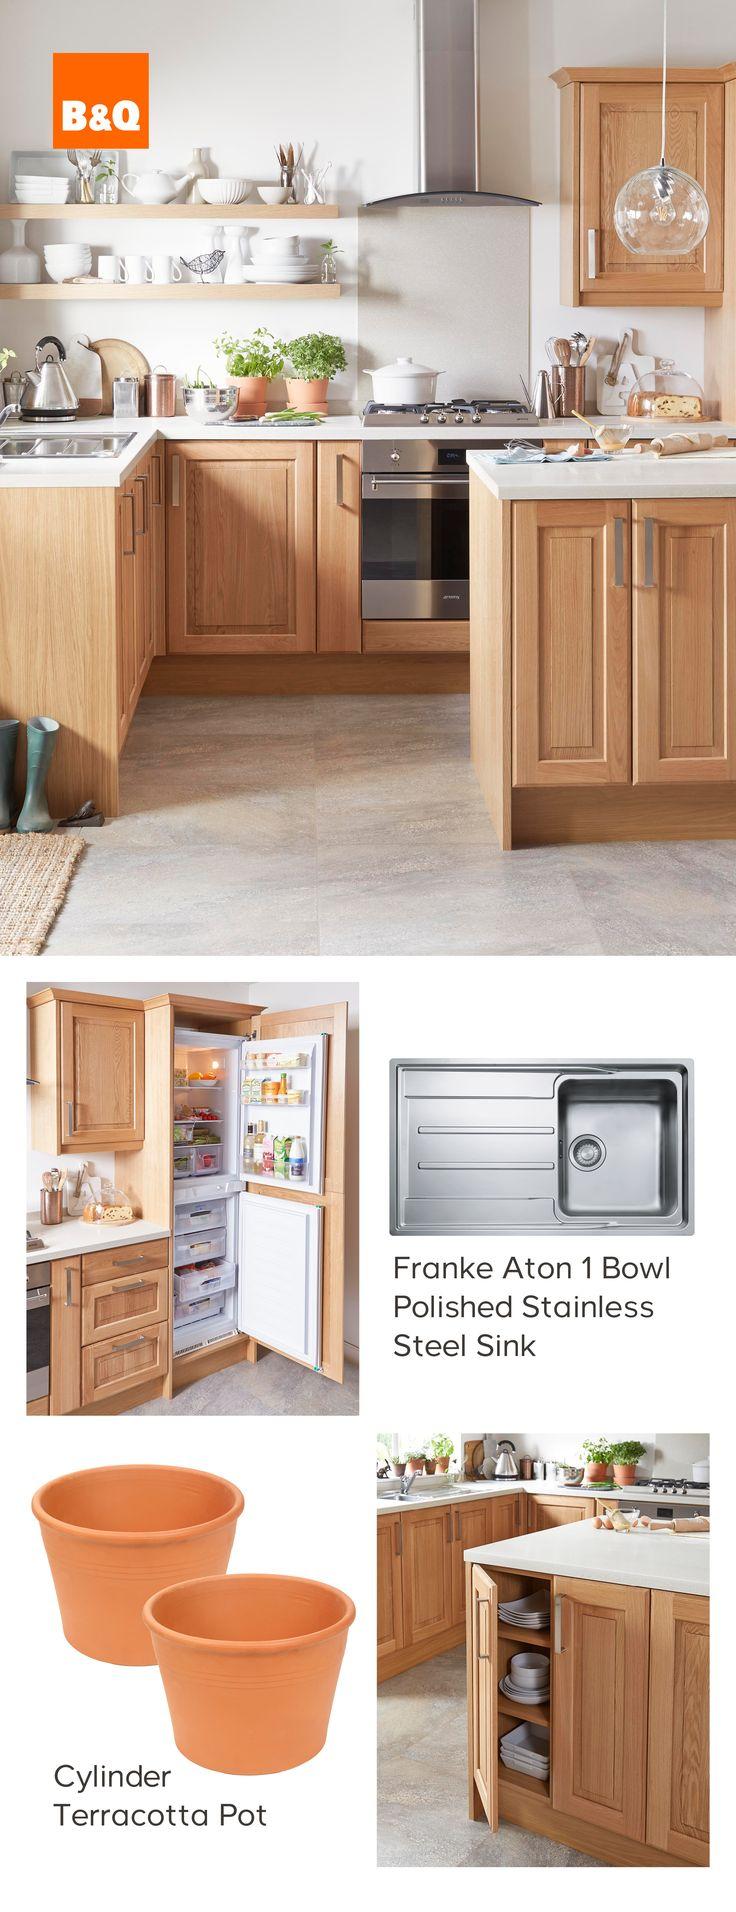 Home kitchen collection kitchen families glendevon family glendevon - This Chesterton Solid Oak Kitchen Emphasises